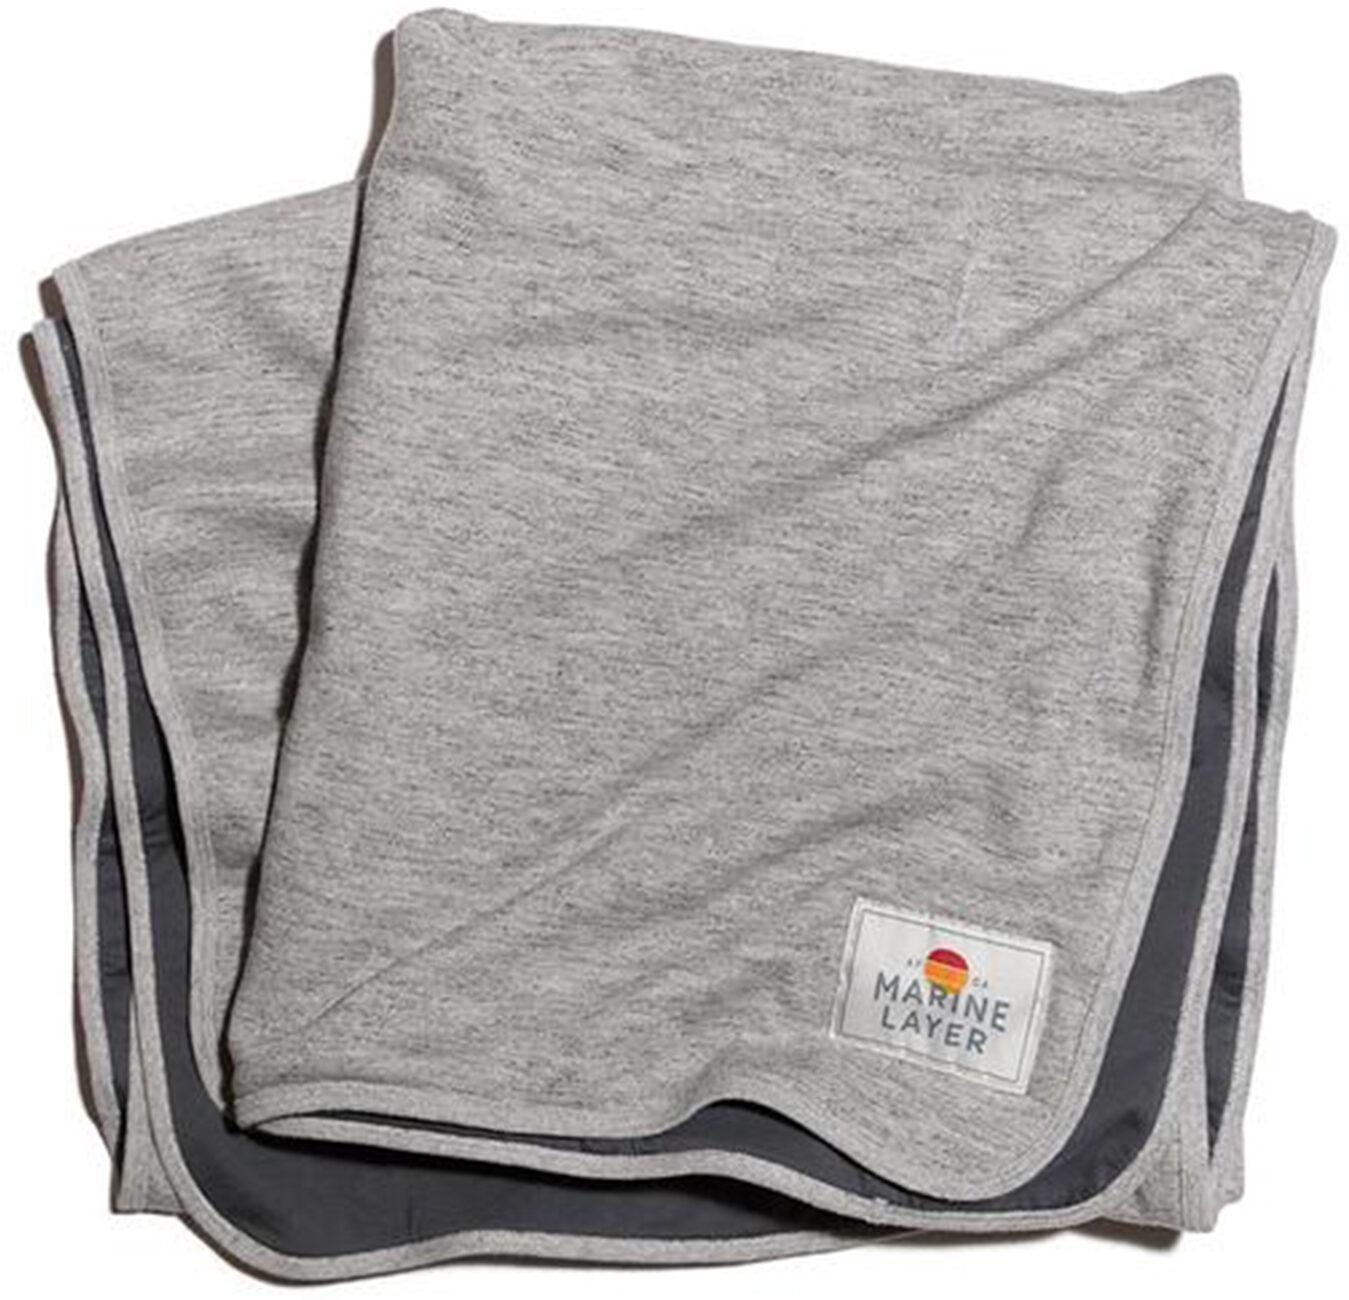 marine-layer-blanket